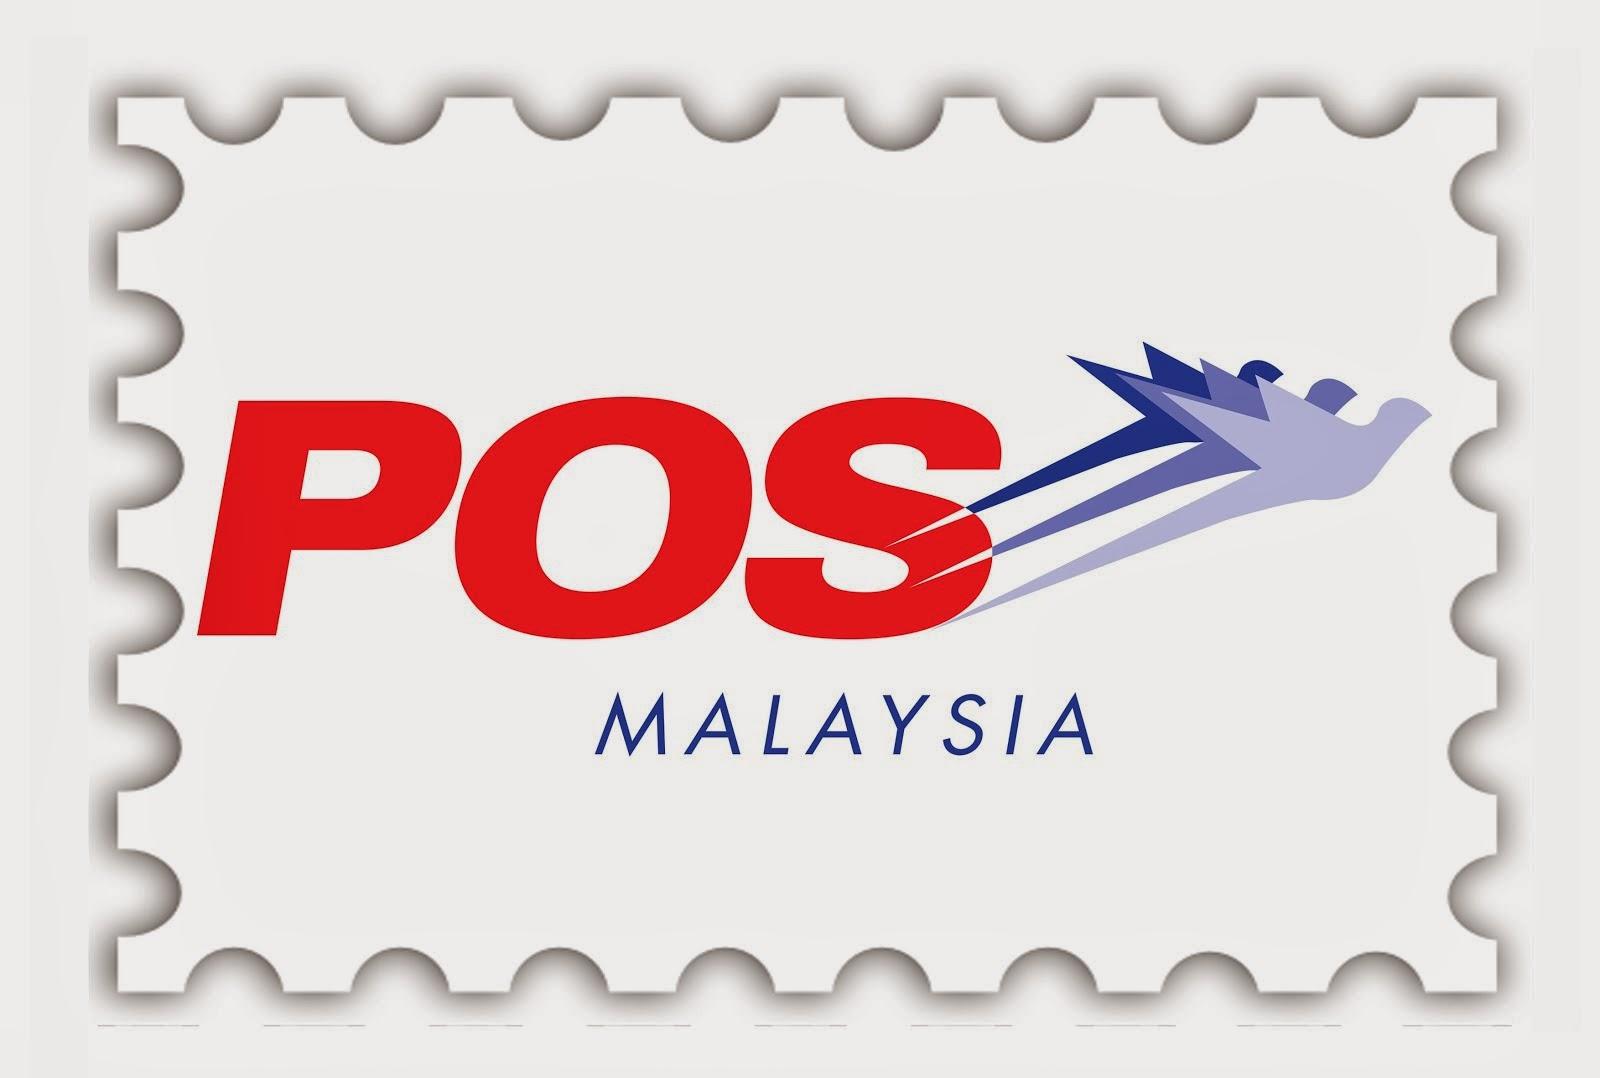 Shipment Tracking Pos Malaysia